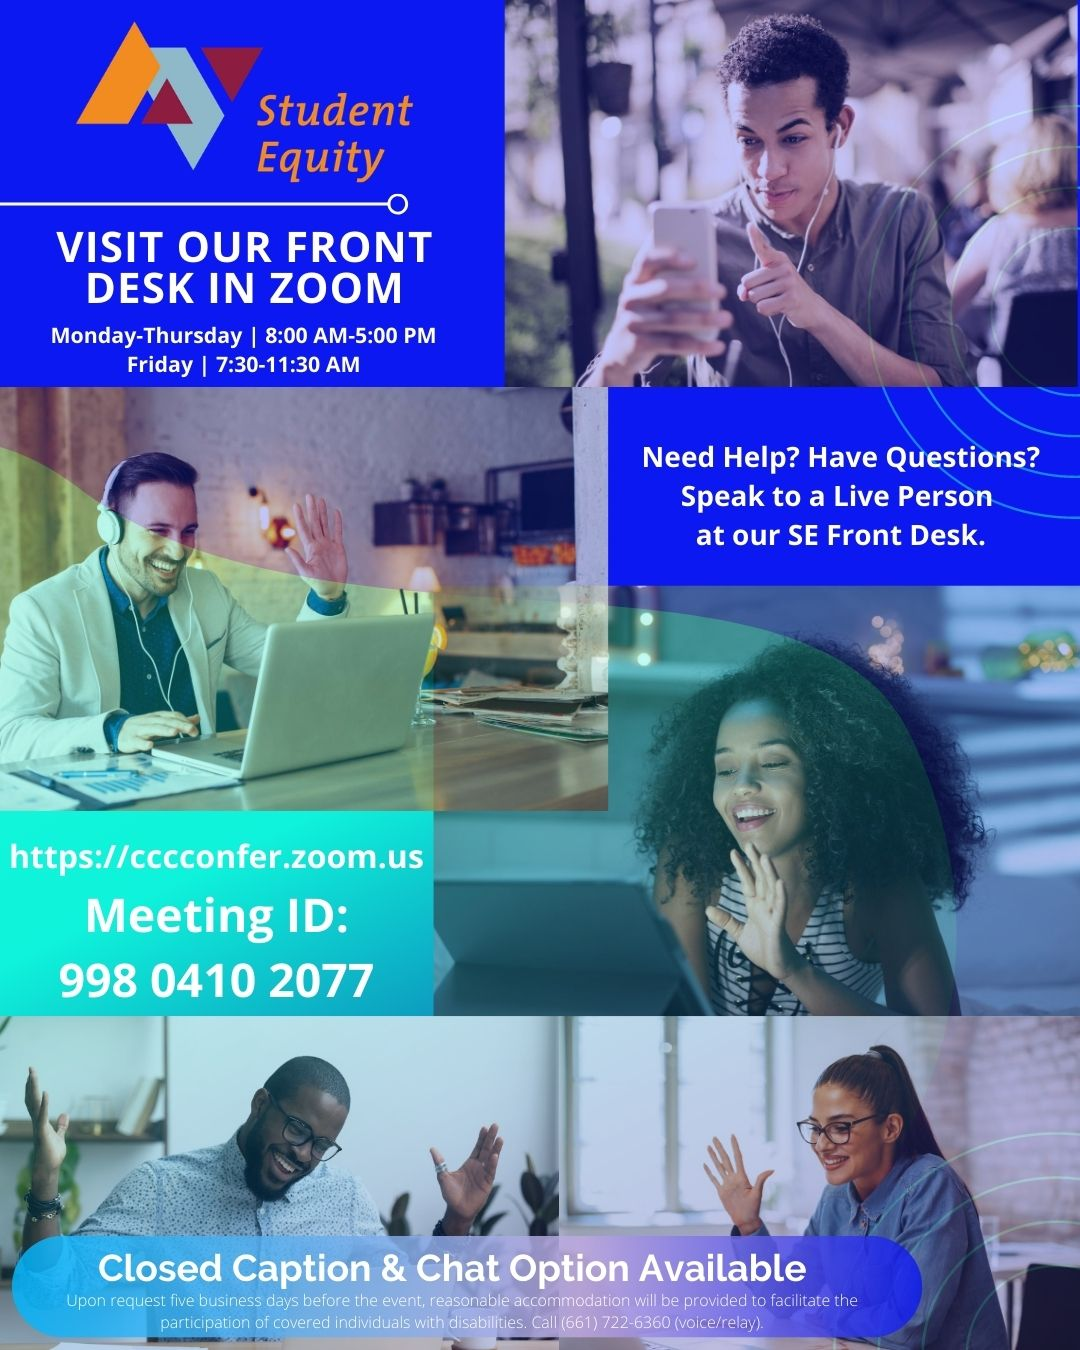 Student Equity Zoom Front Desk Flyer